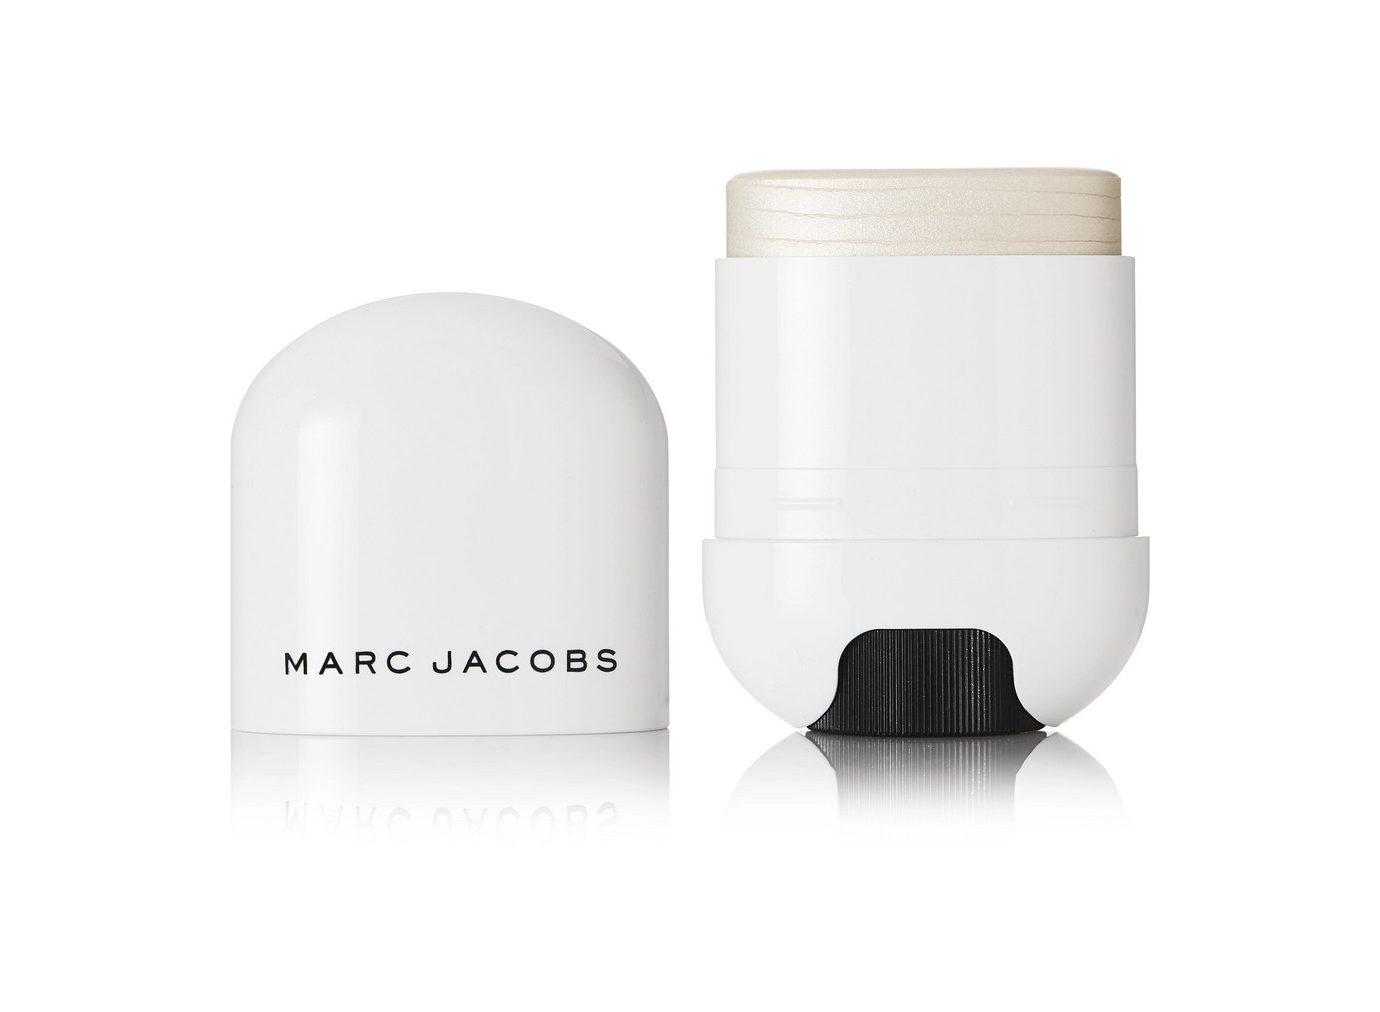 Summer Glow product Marc Jacobs Beauty Glow Stick Glistening Illuminator